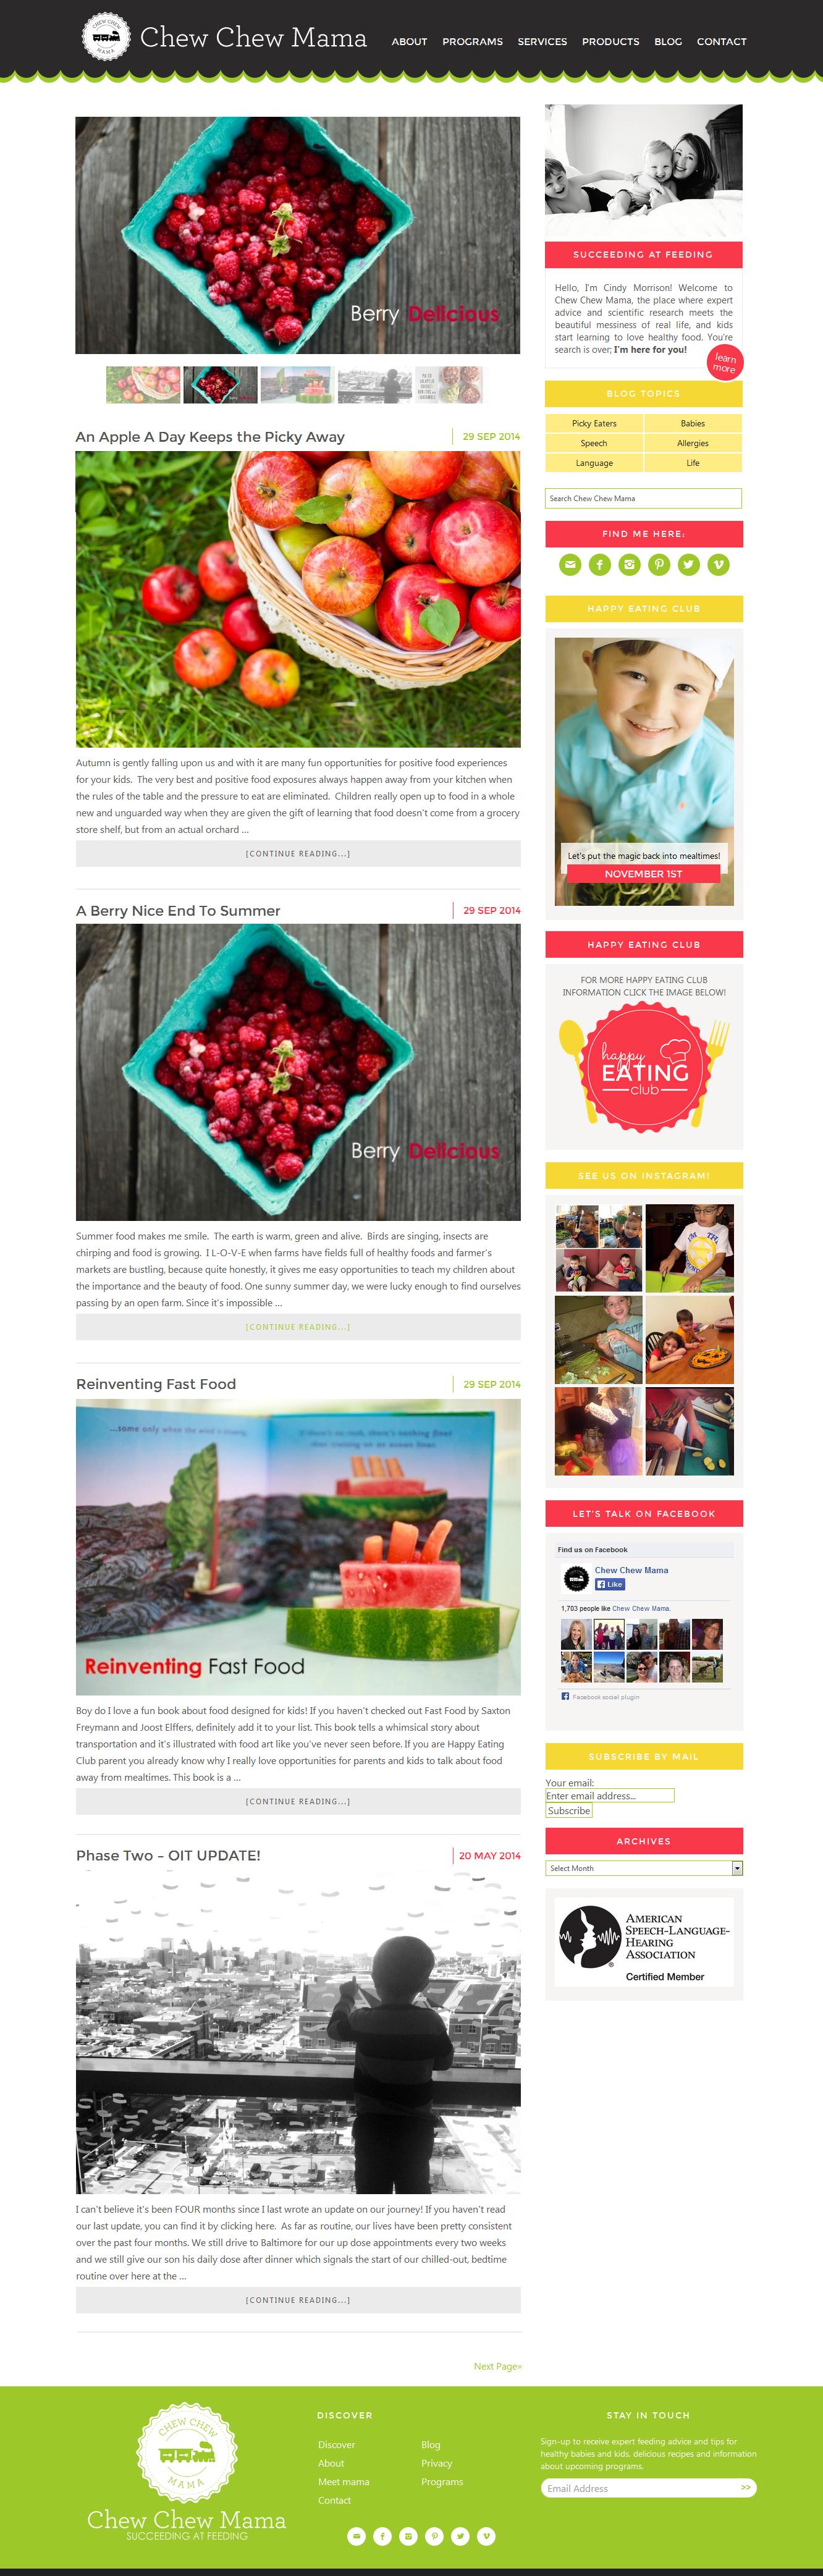 Chew-Chew-Mama-custom-blog-design-full-design